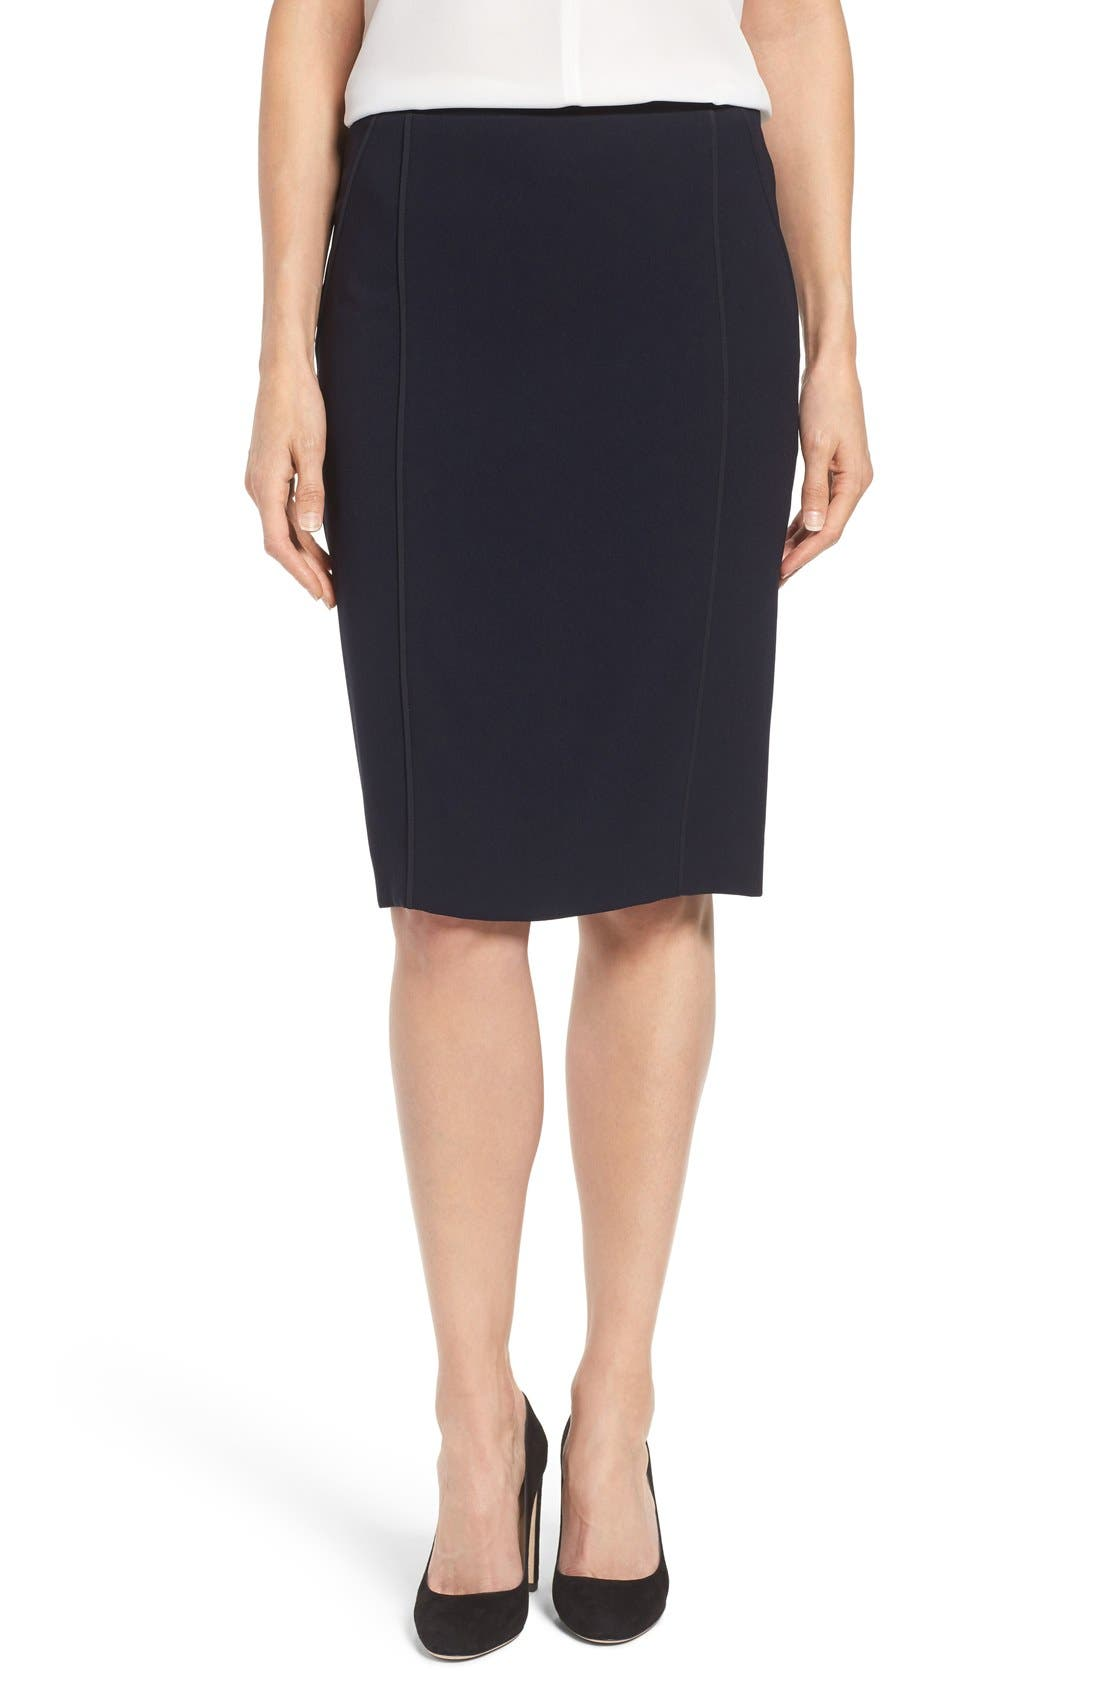 Alternate Image 1 Selected - Elie Tahari 'Jasper' Pencil Skirt